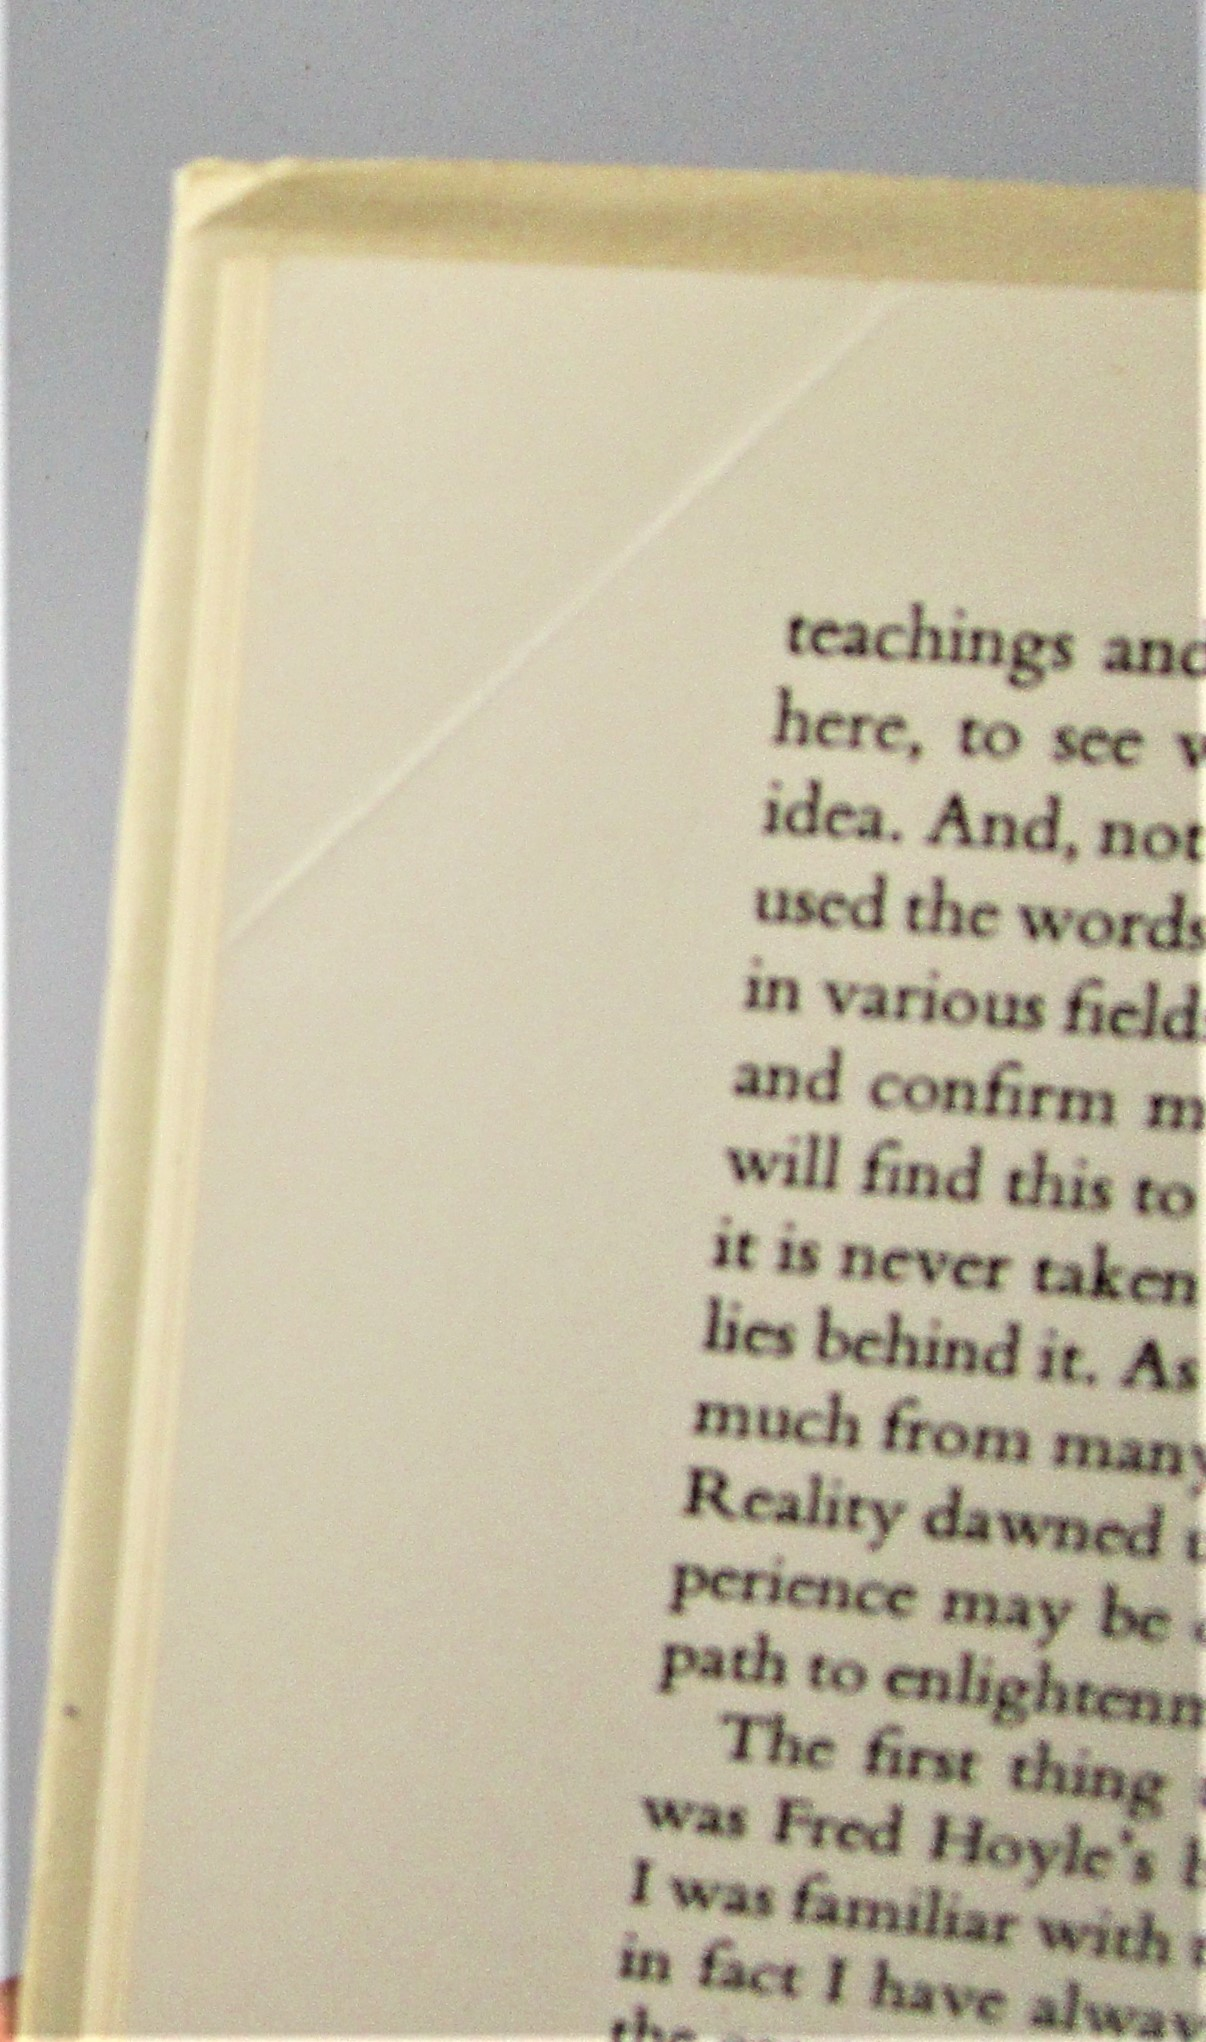 NETI NETI (NOT THIS NOT THAT), by L.C. Beckett - 1959